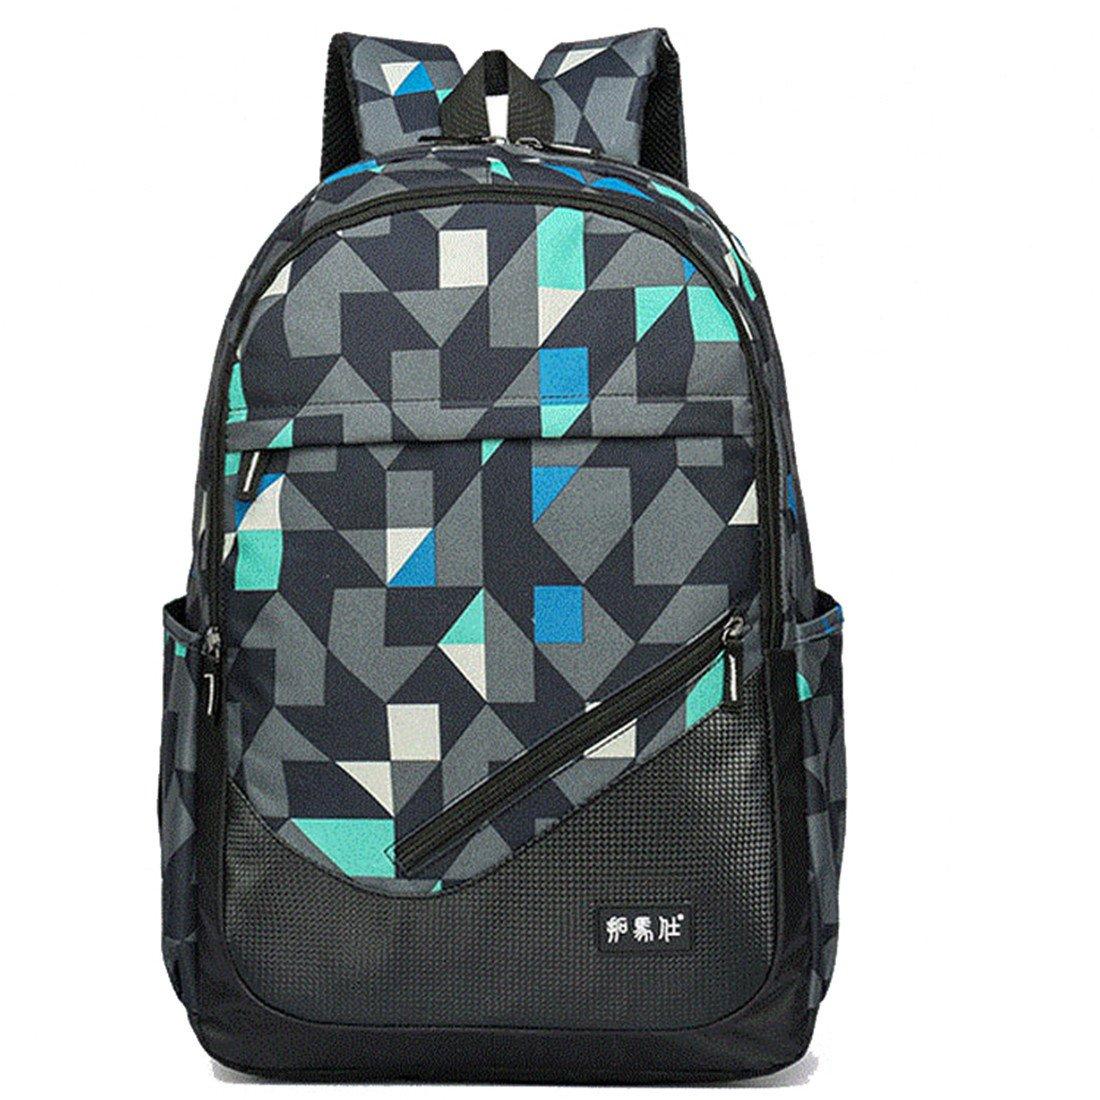 Maod juveniles Backpack Impermeables Mochila de Ordenador Impresión Bolsos Escolares portatil mochilas